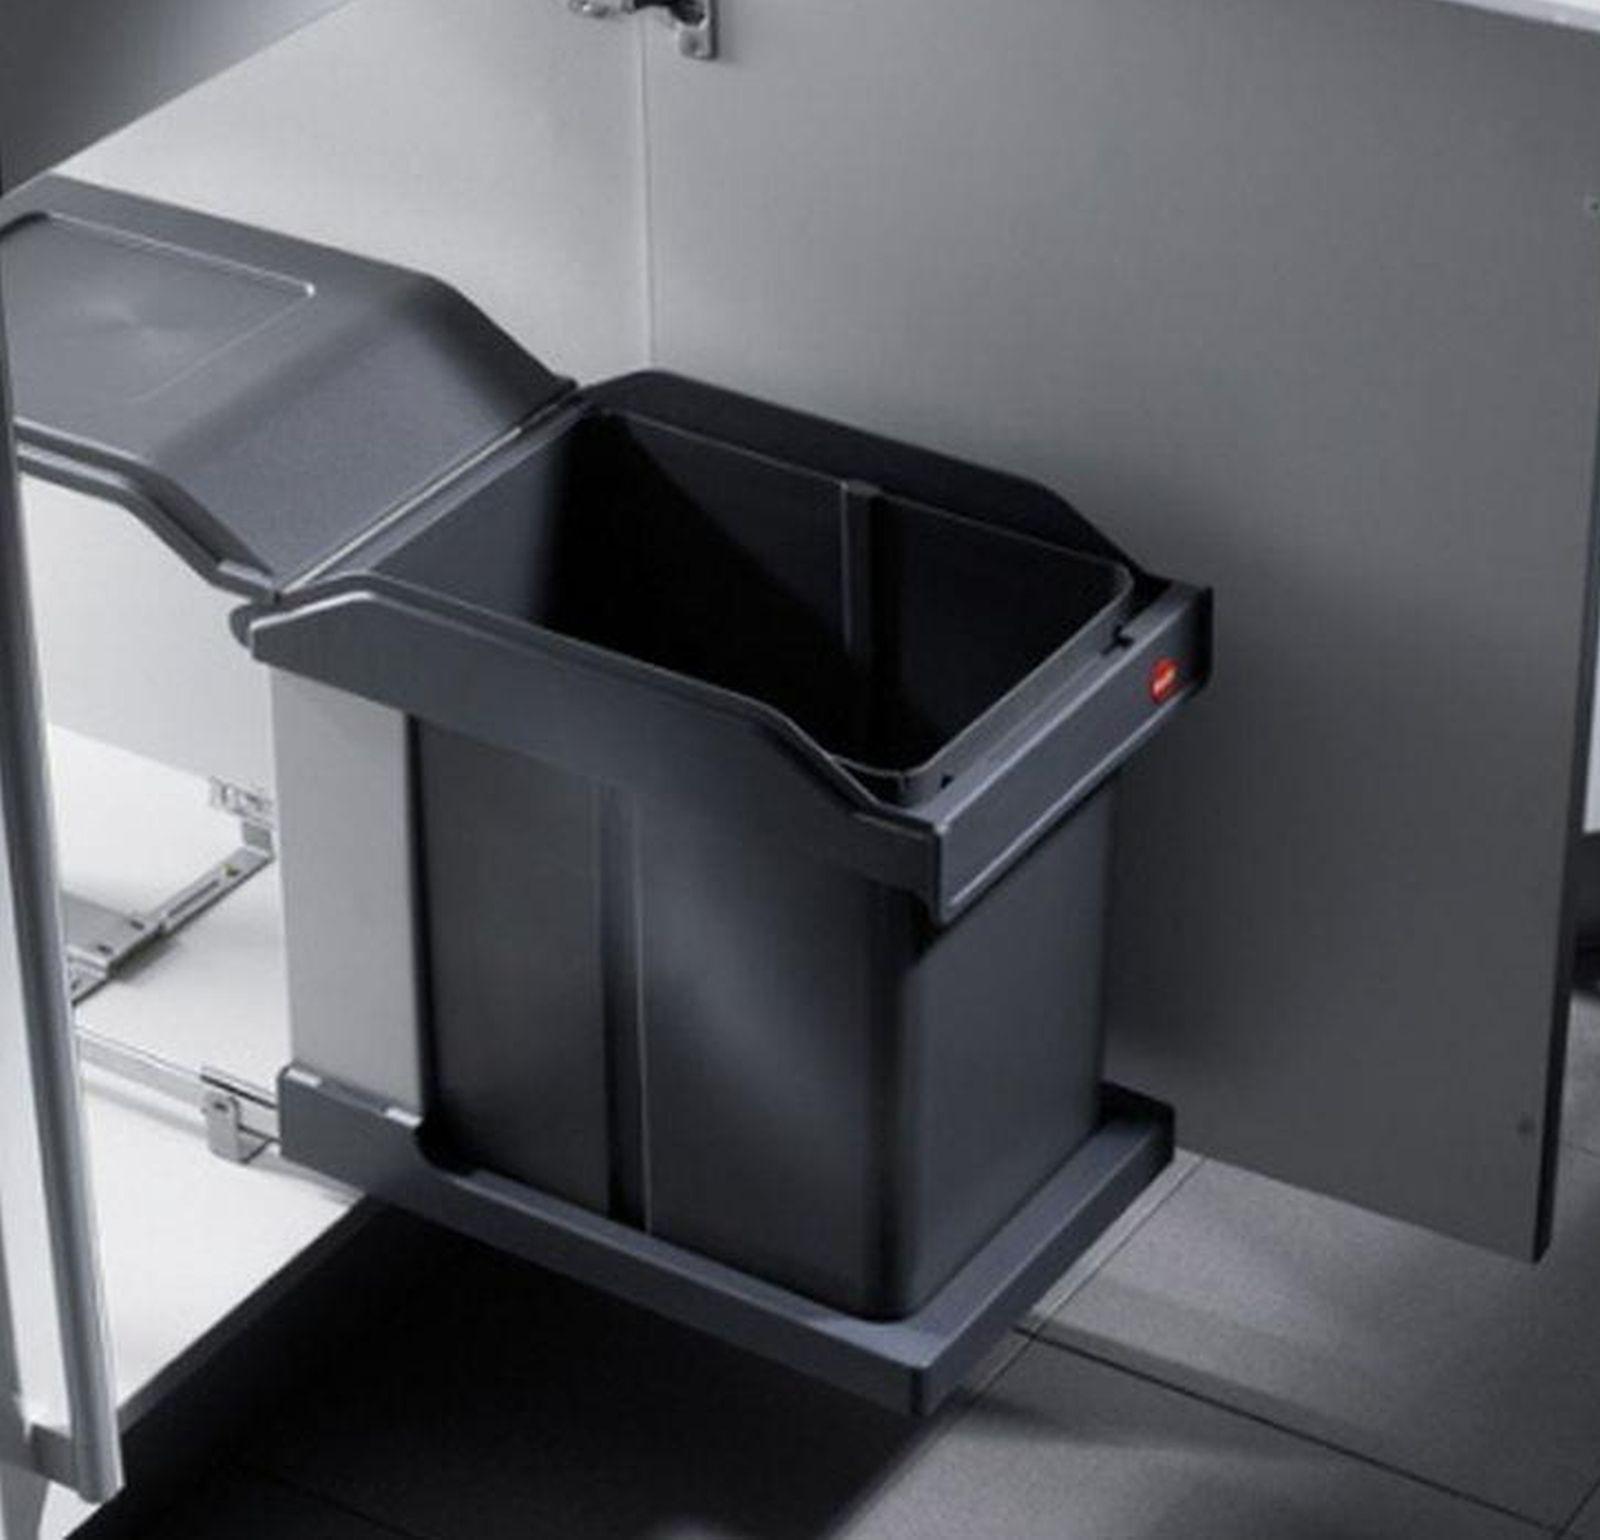 hailo solo automatik 20 liter abfall m lleimer k che ausfahrautomatik 515974 kaufen bei. Black Bedroom Furniture Sets. Home Design Ideas